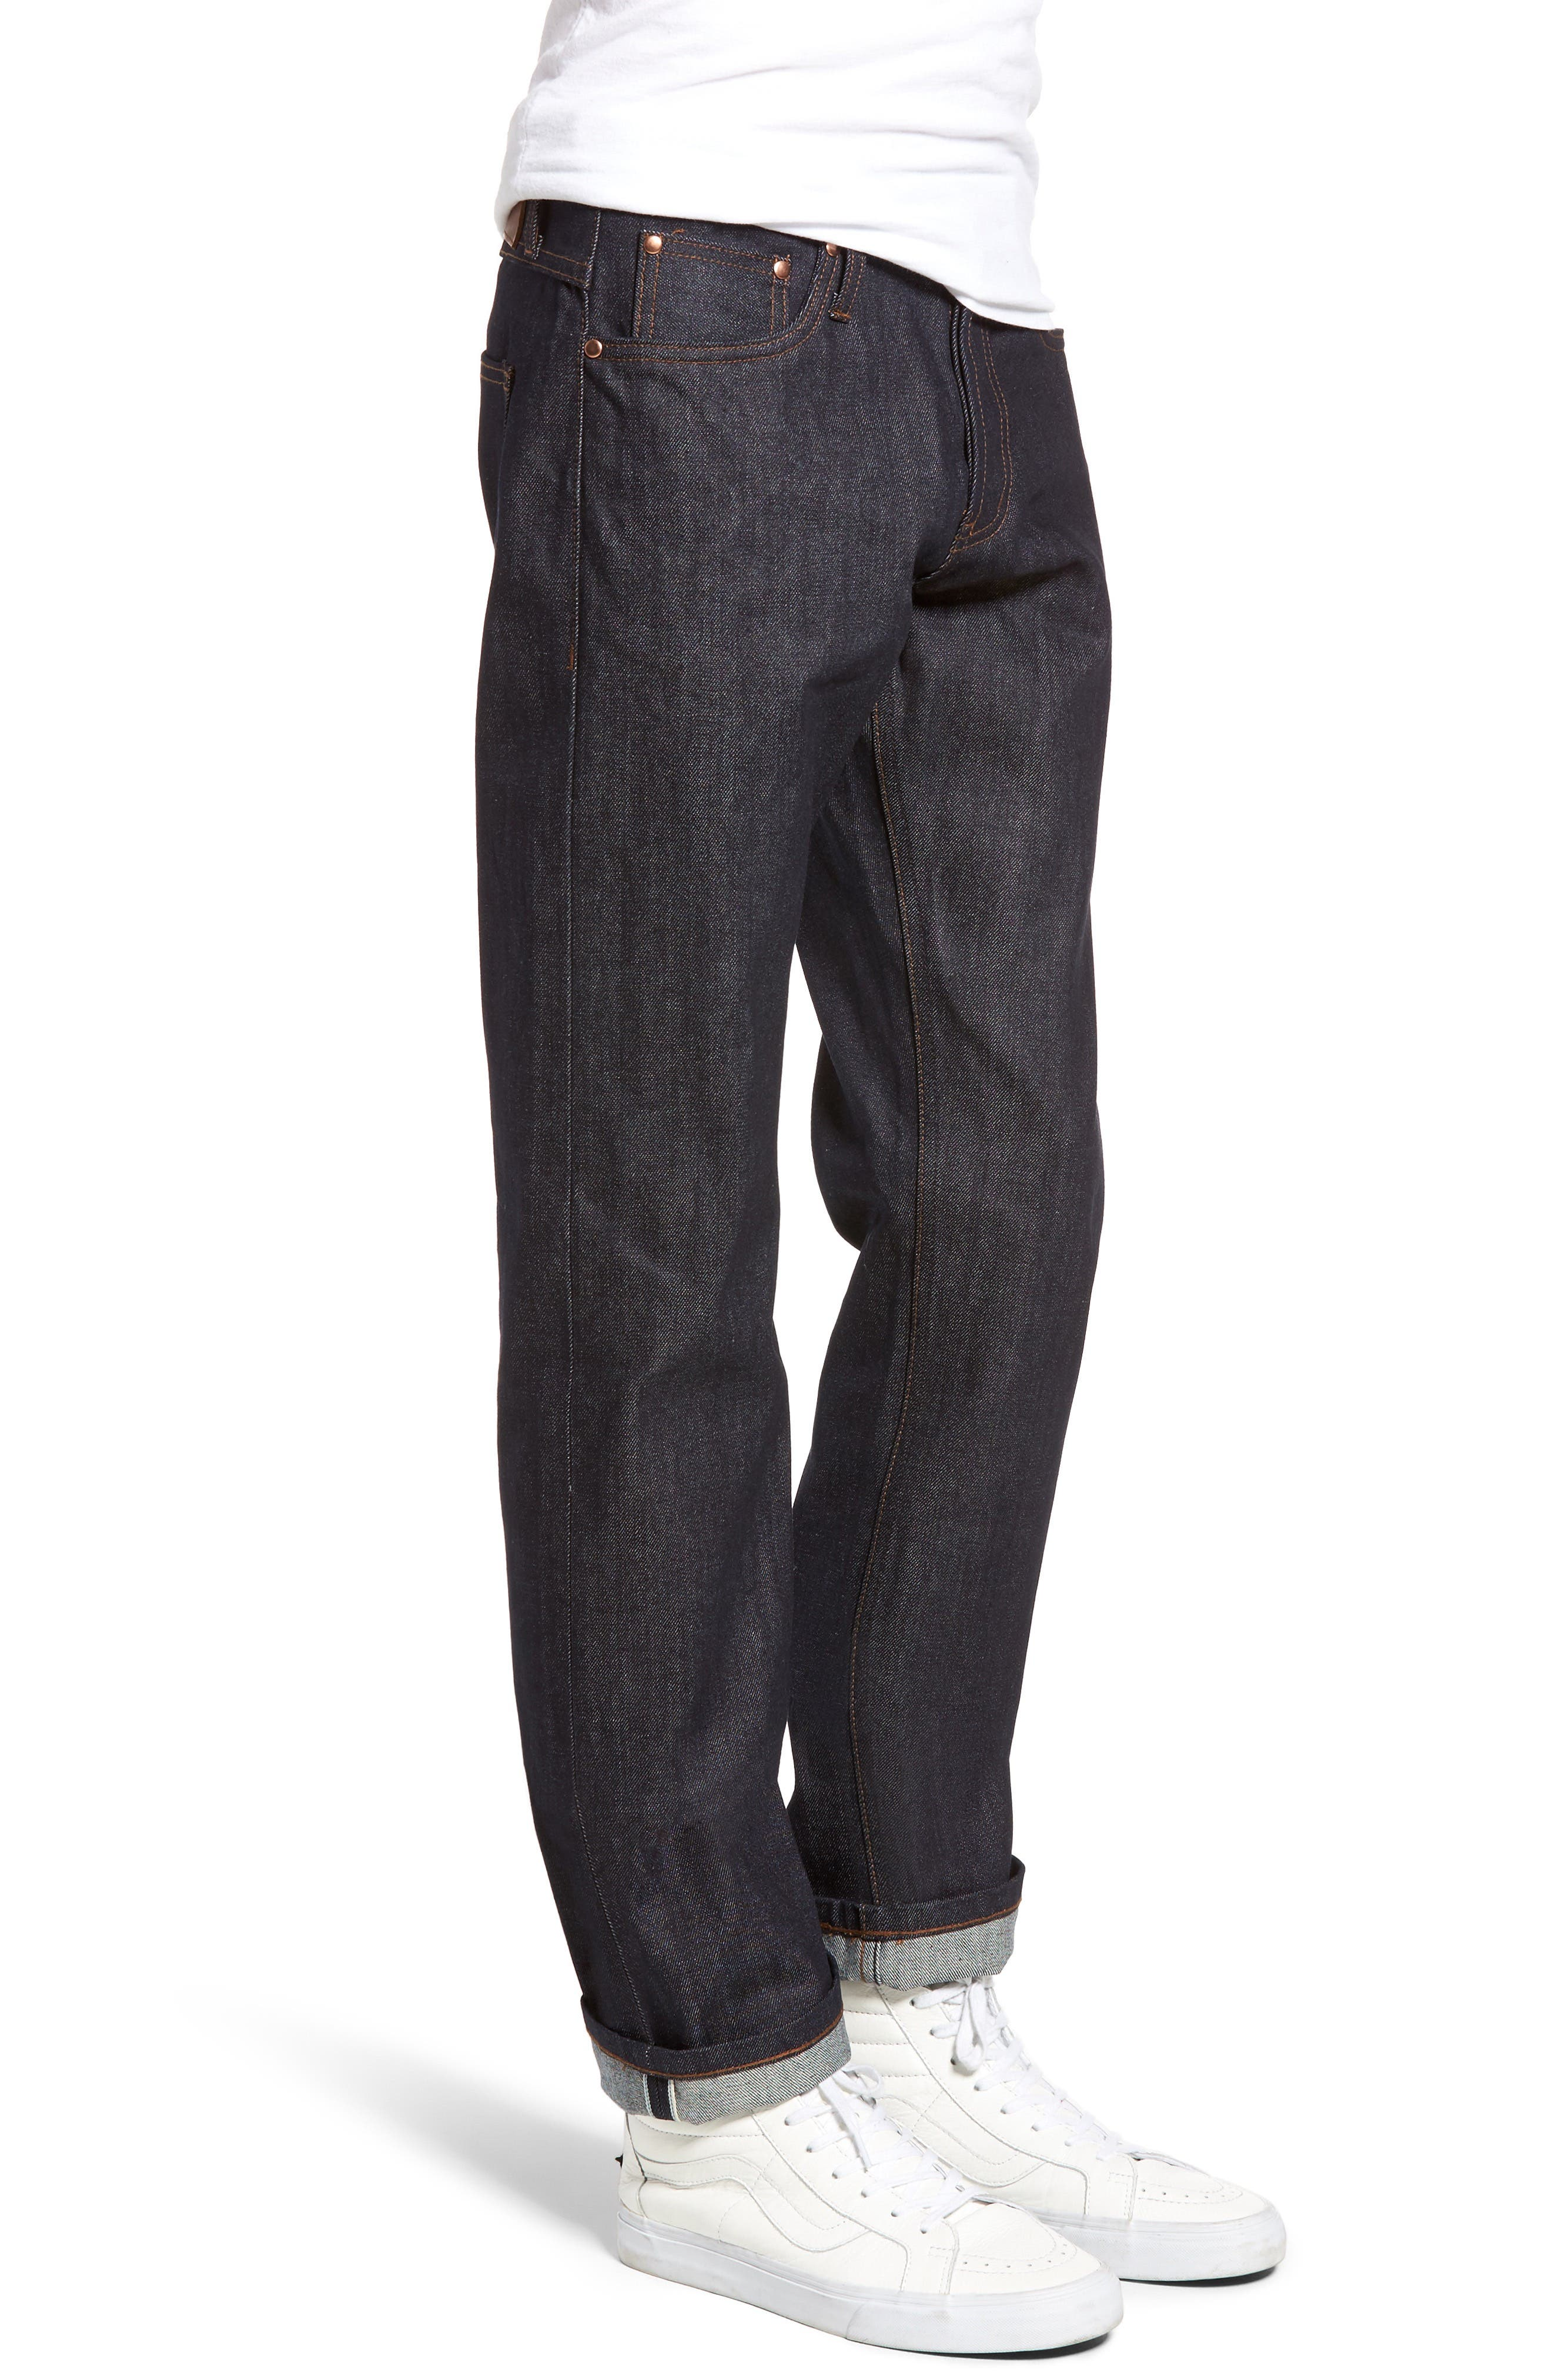 Alternate Image 3  - The Unbranded Brand UB301 Straight Leg Raw Selvedge Jeans (Indigo)